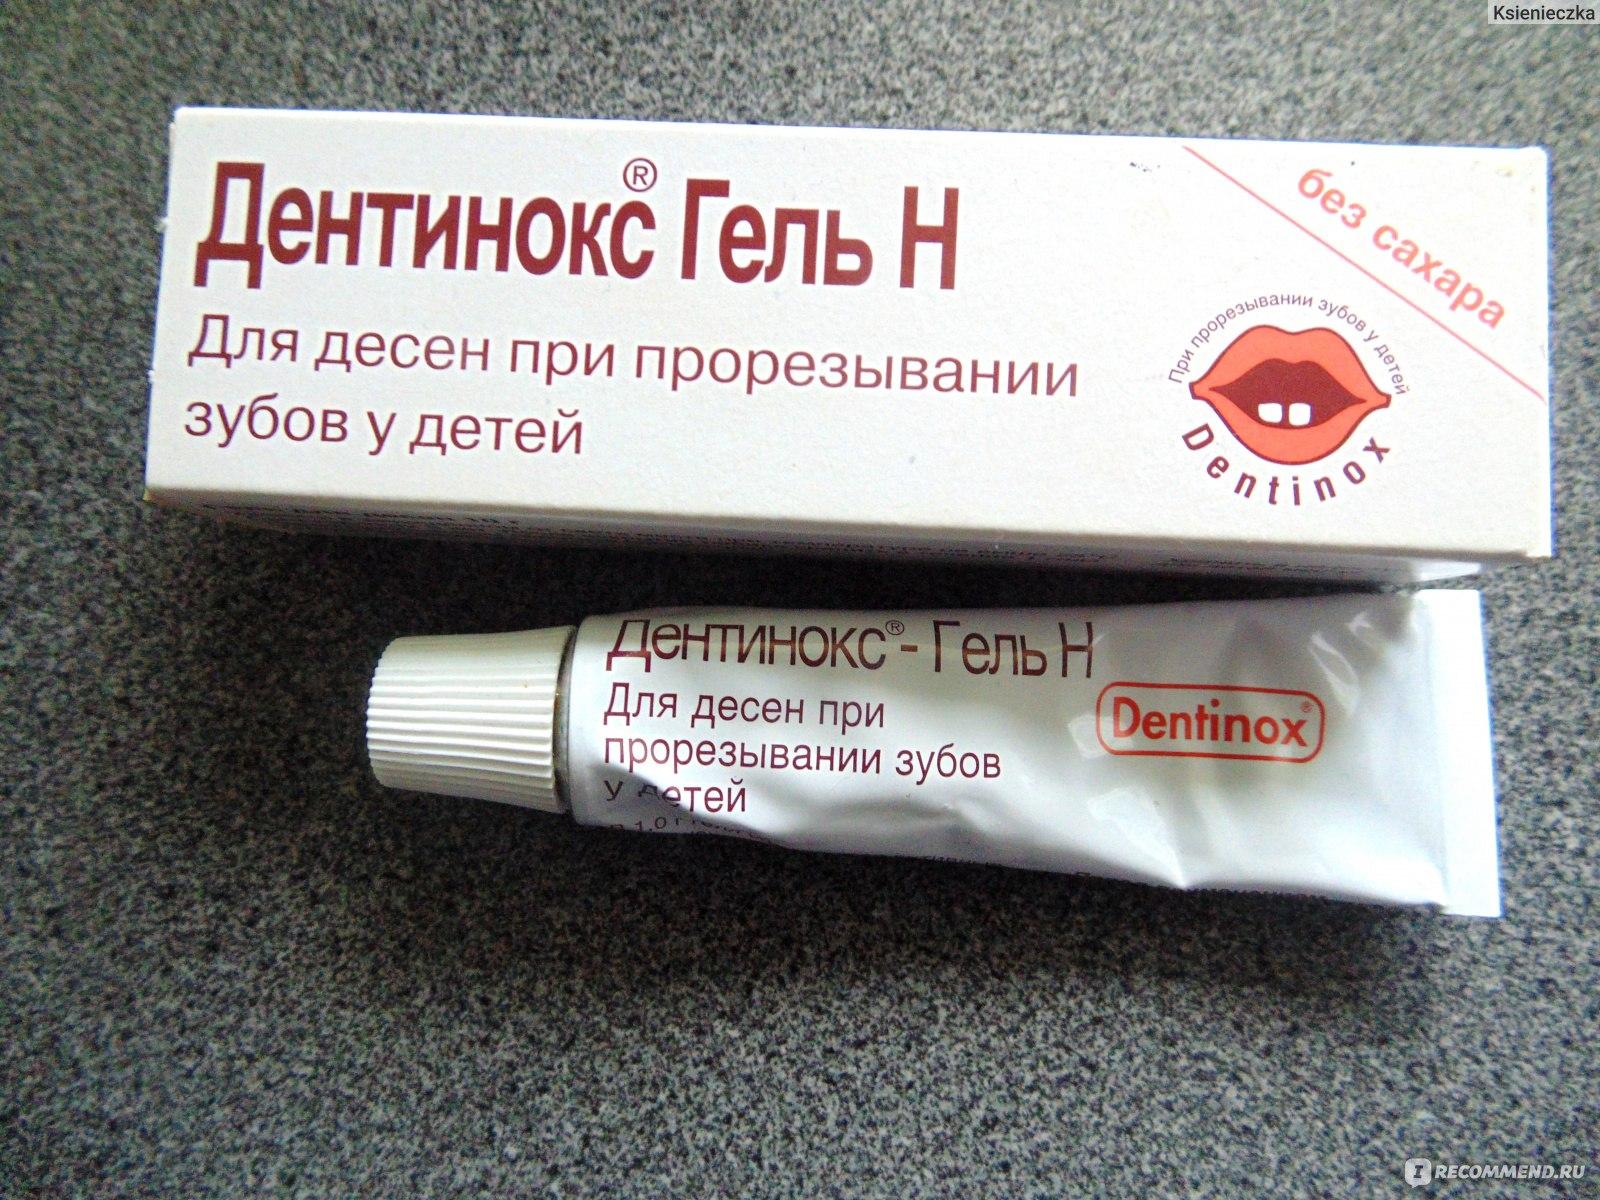 Отзывы о препарате дентинокс